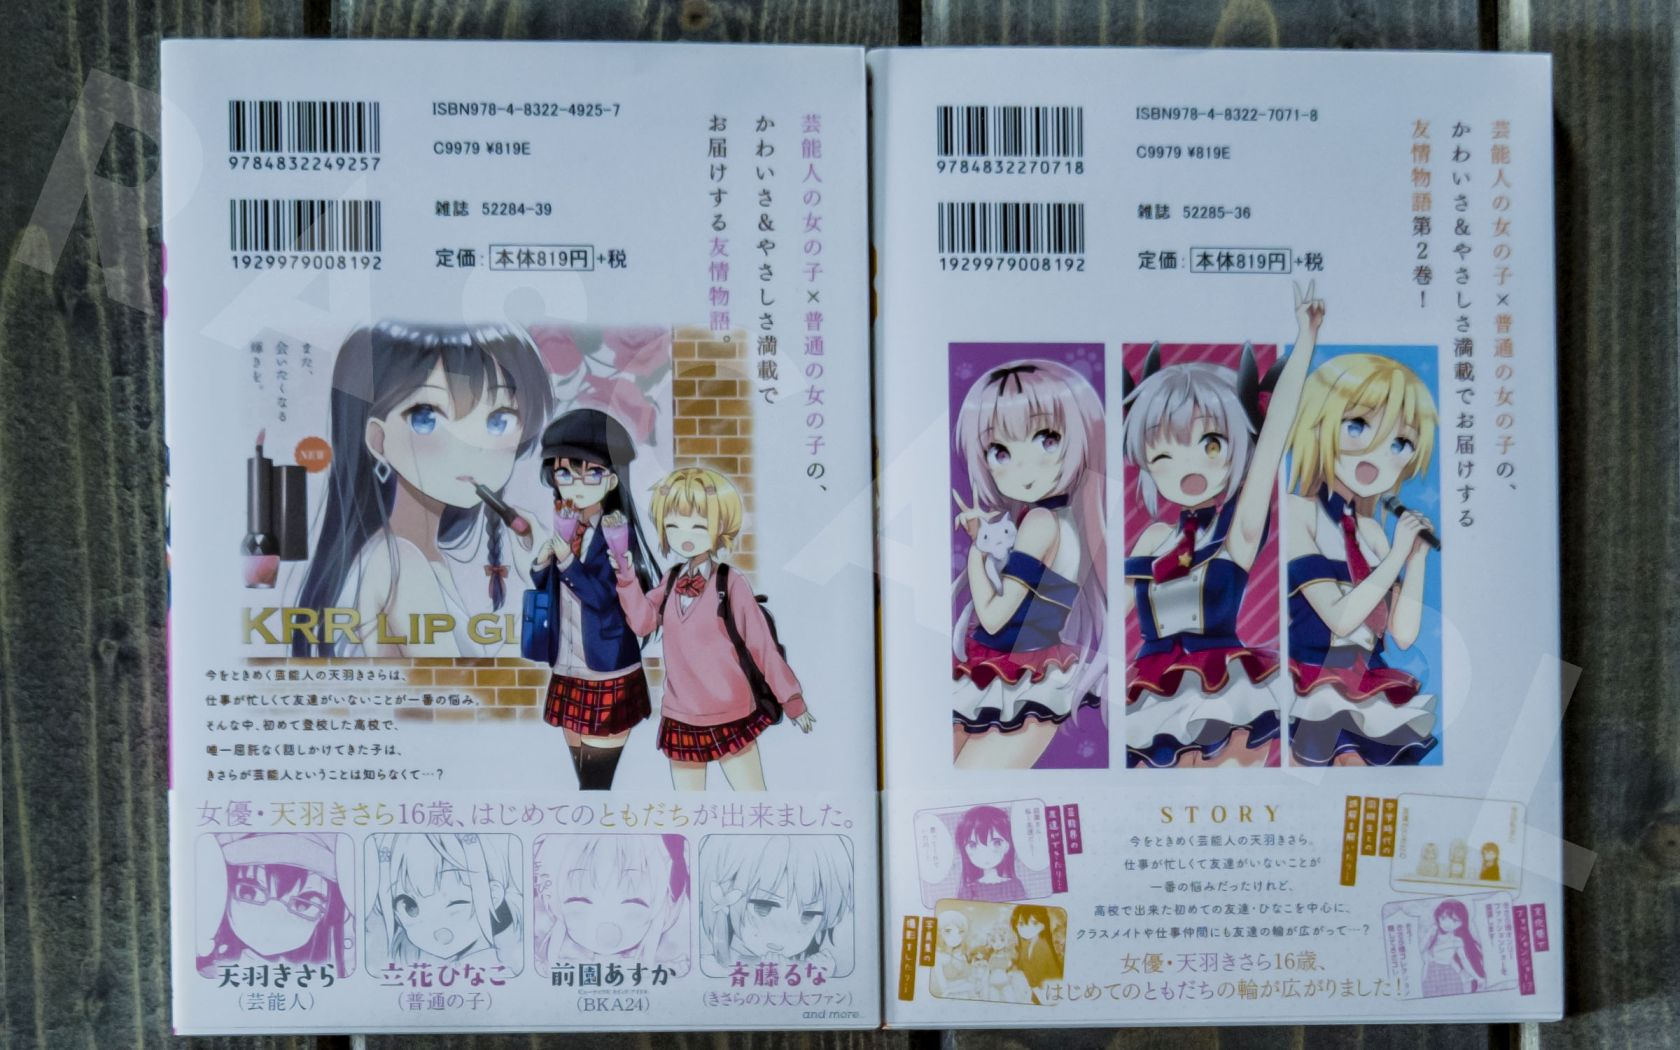 Mata Kyoushitsu de (1-2) - Manga Time Kirara - Nowości w kolekcji mangi (listopad 2020) - rascal.pl